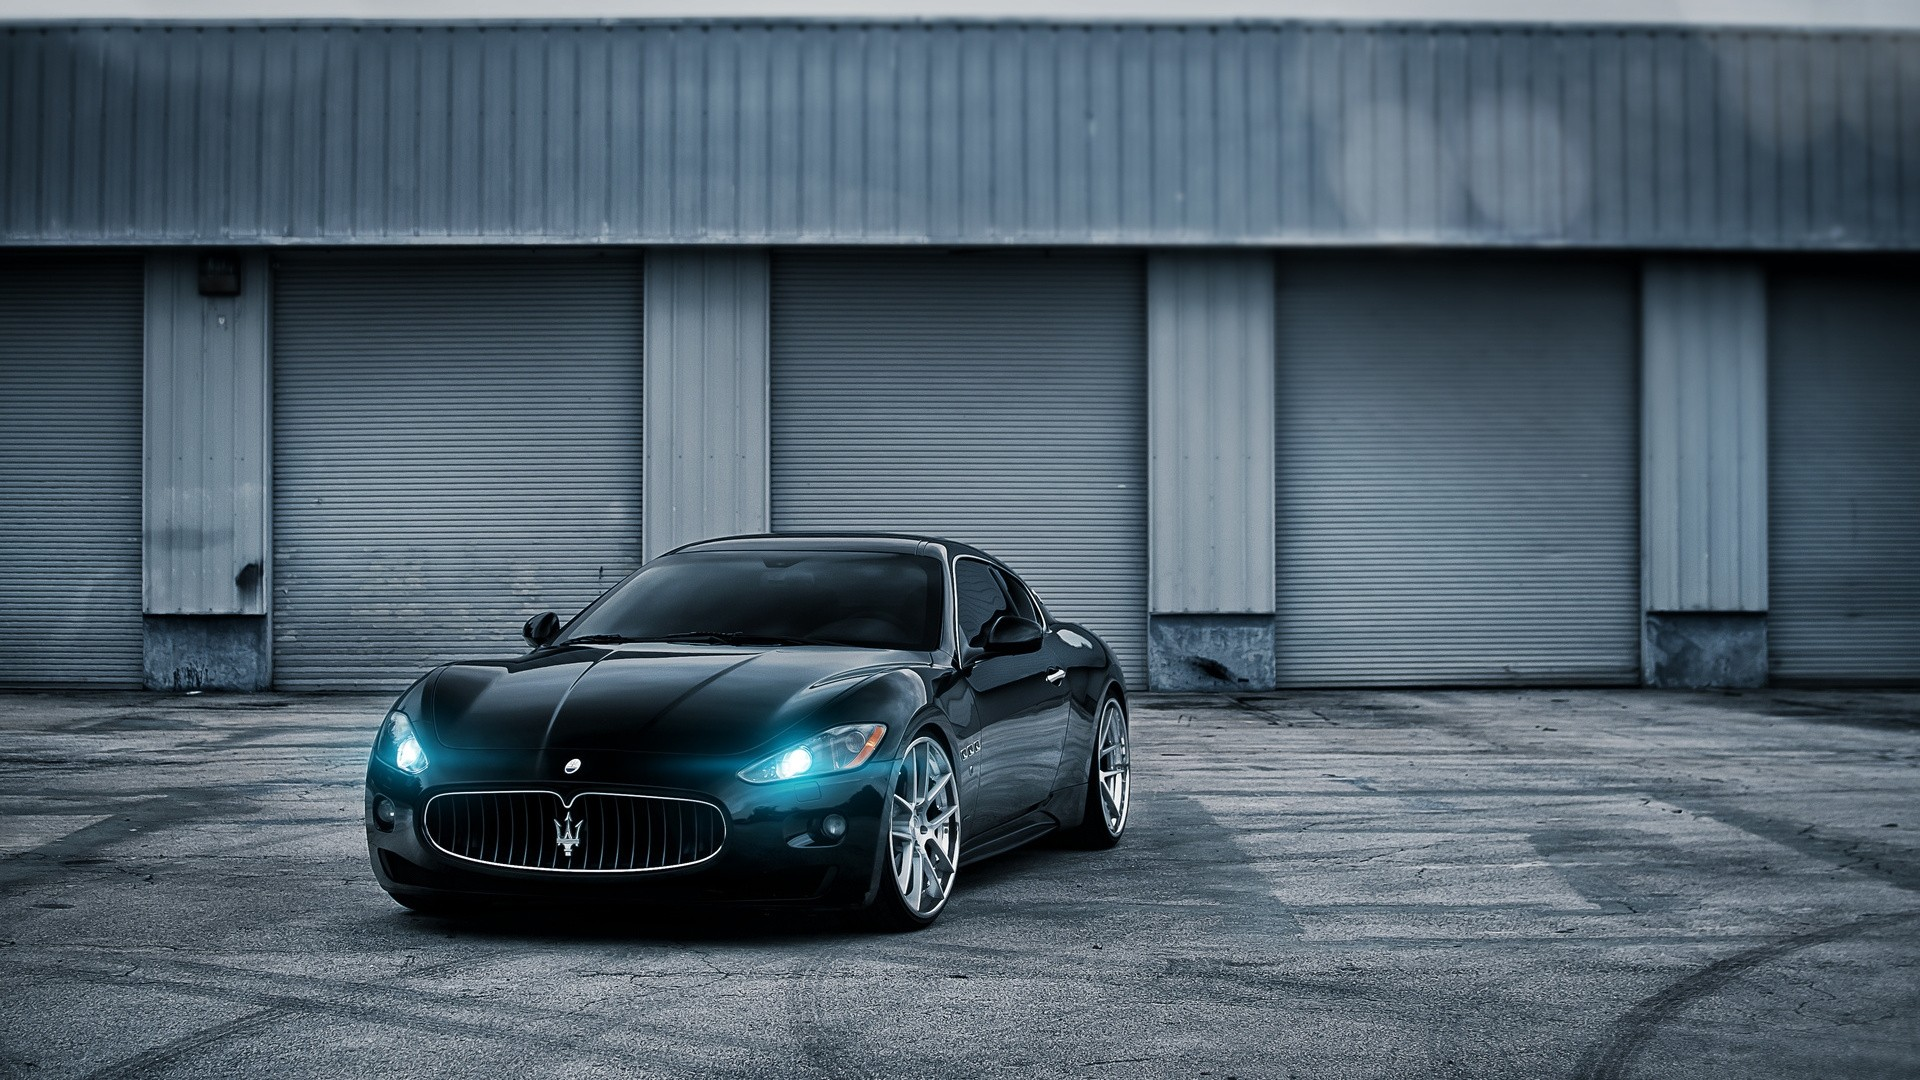 Maserati Wallpaper 1920x1080